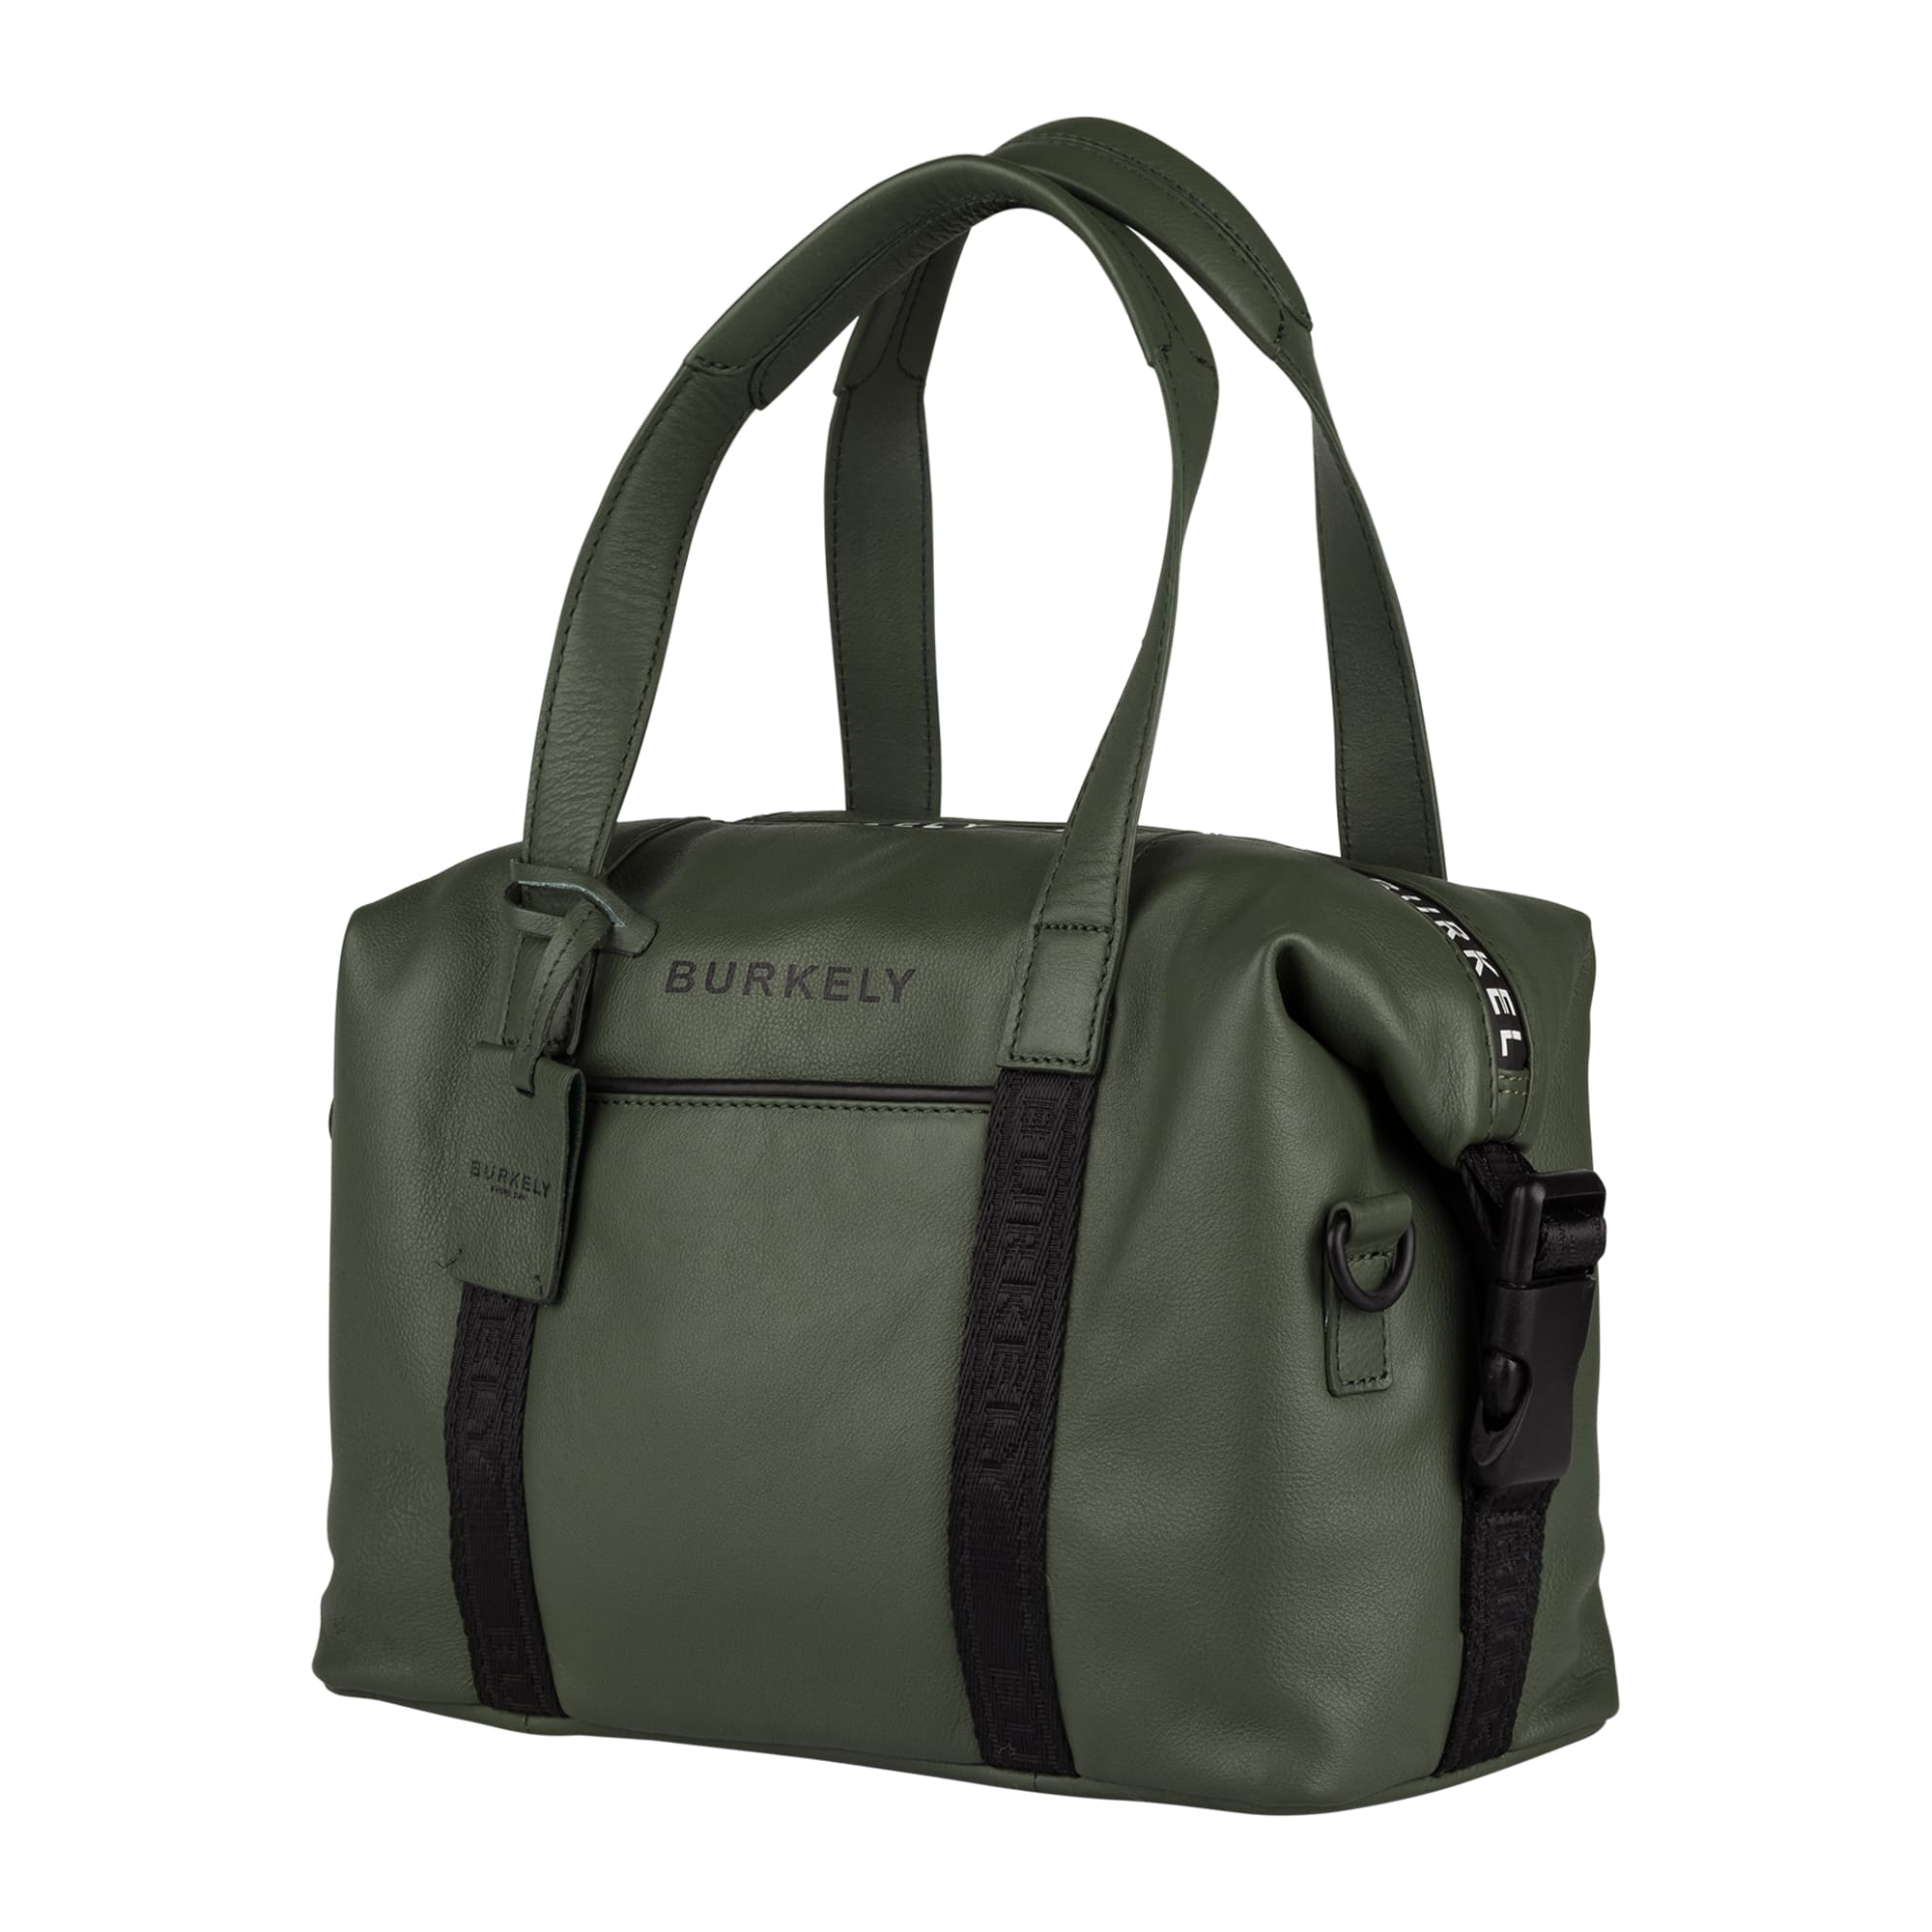 Burkely Rebel Reese Small Handbag Green-185057